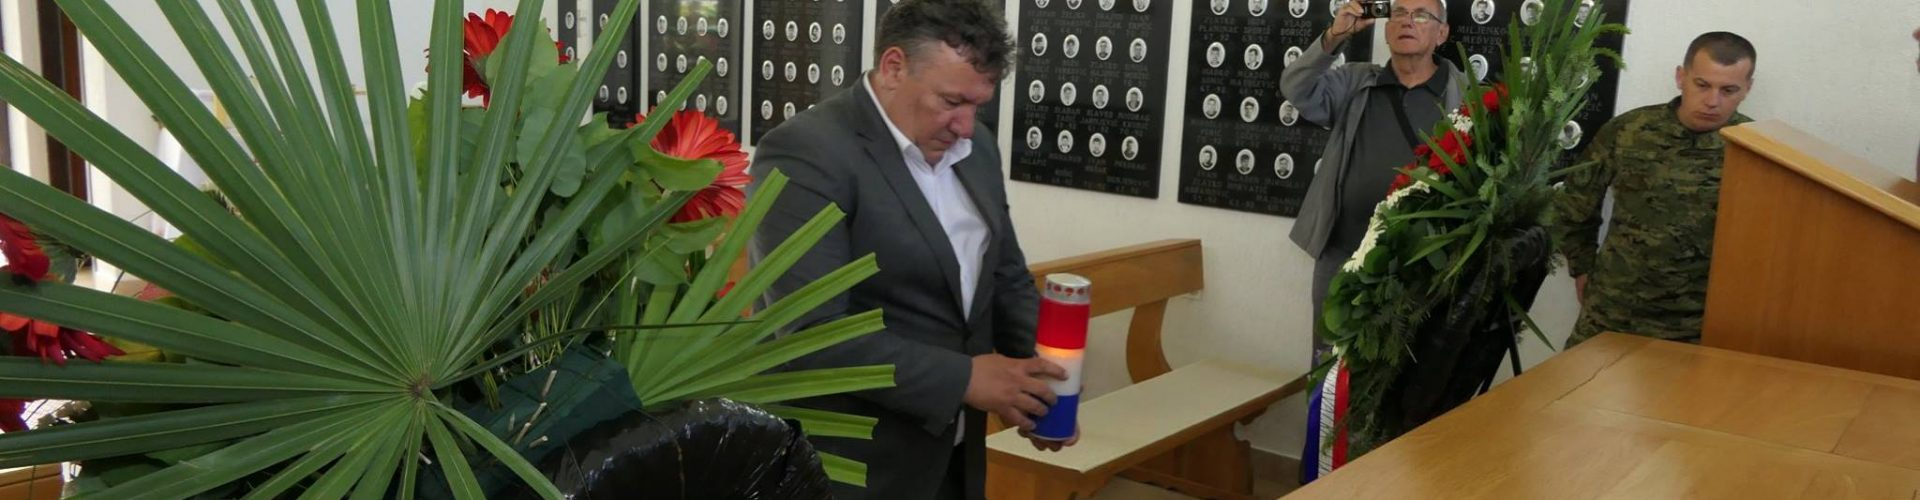 Obilježena 27. obljetnica osnutka Gromova i 11. obljetnica 2. mb Gromovi